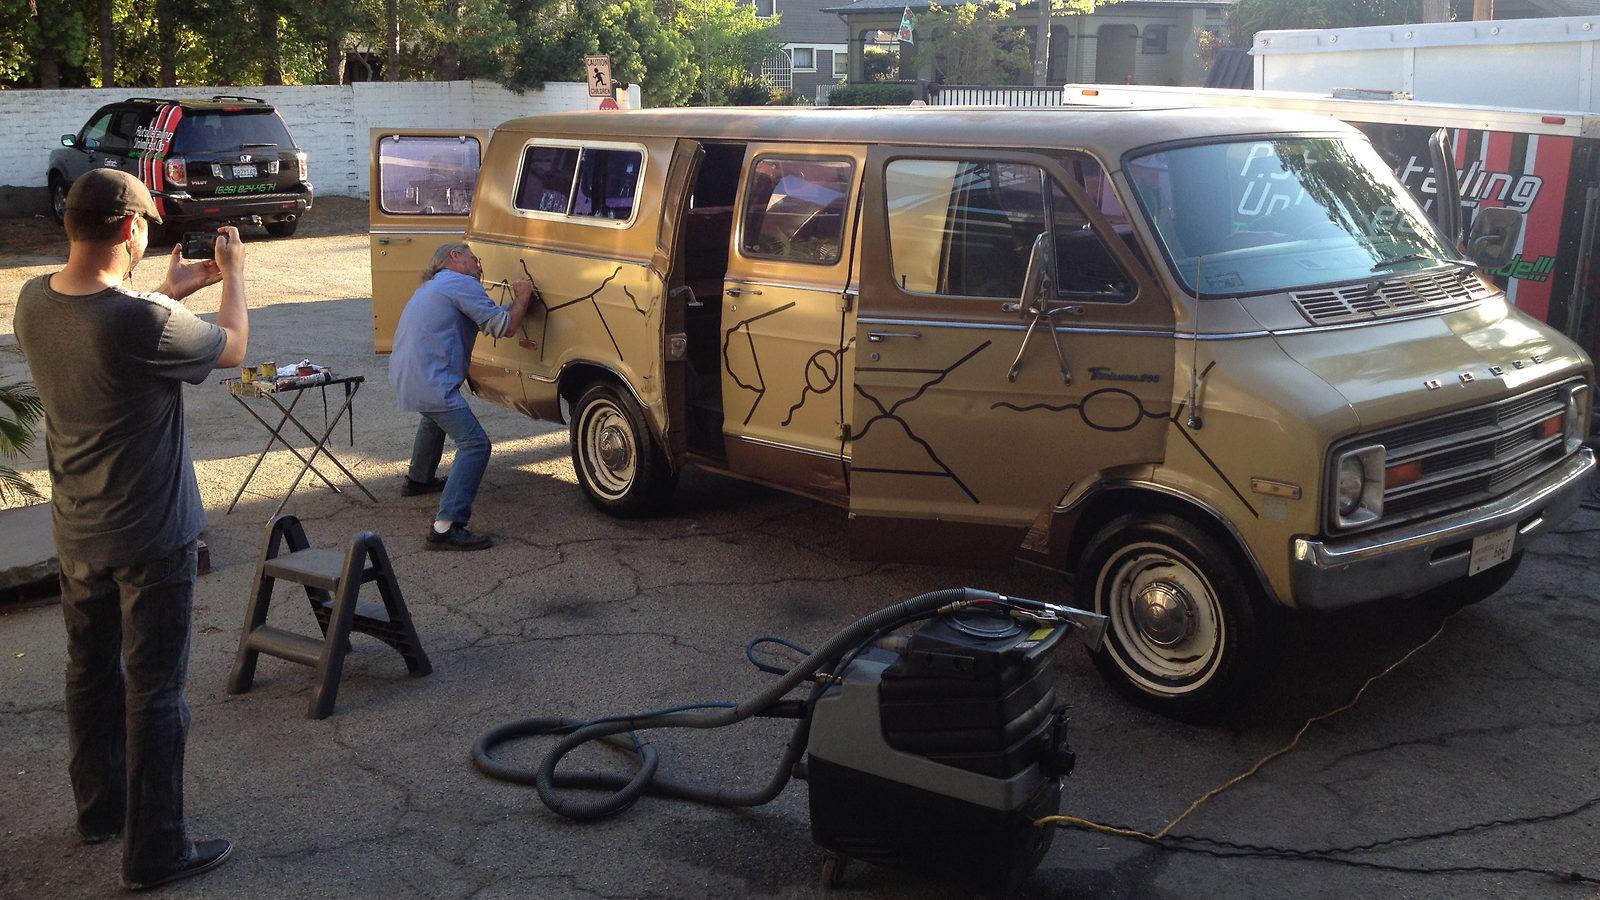 Saving The Feynman Van